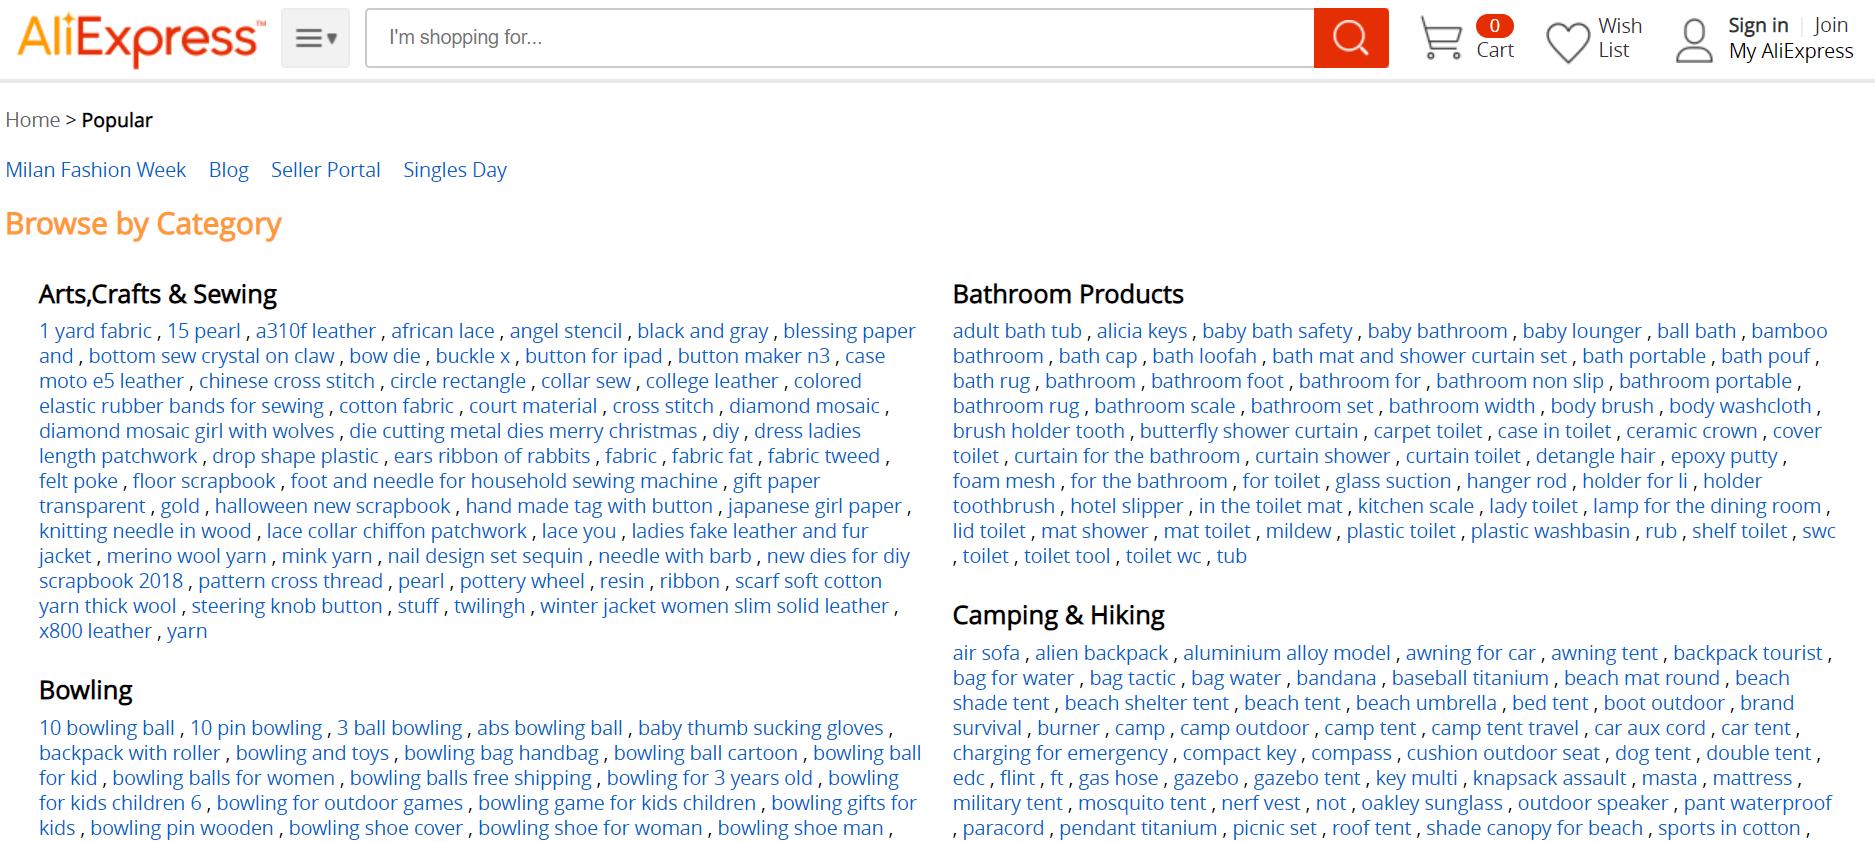 Analyzing AliExpress Start an Online Clothing Business